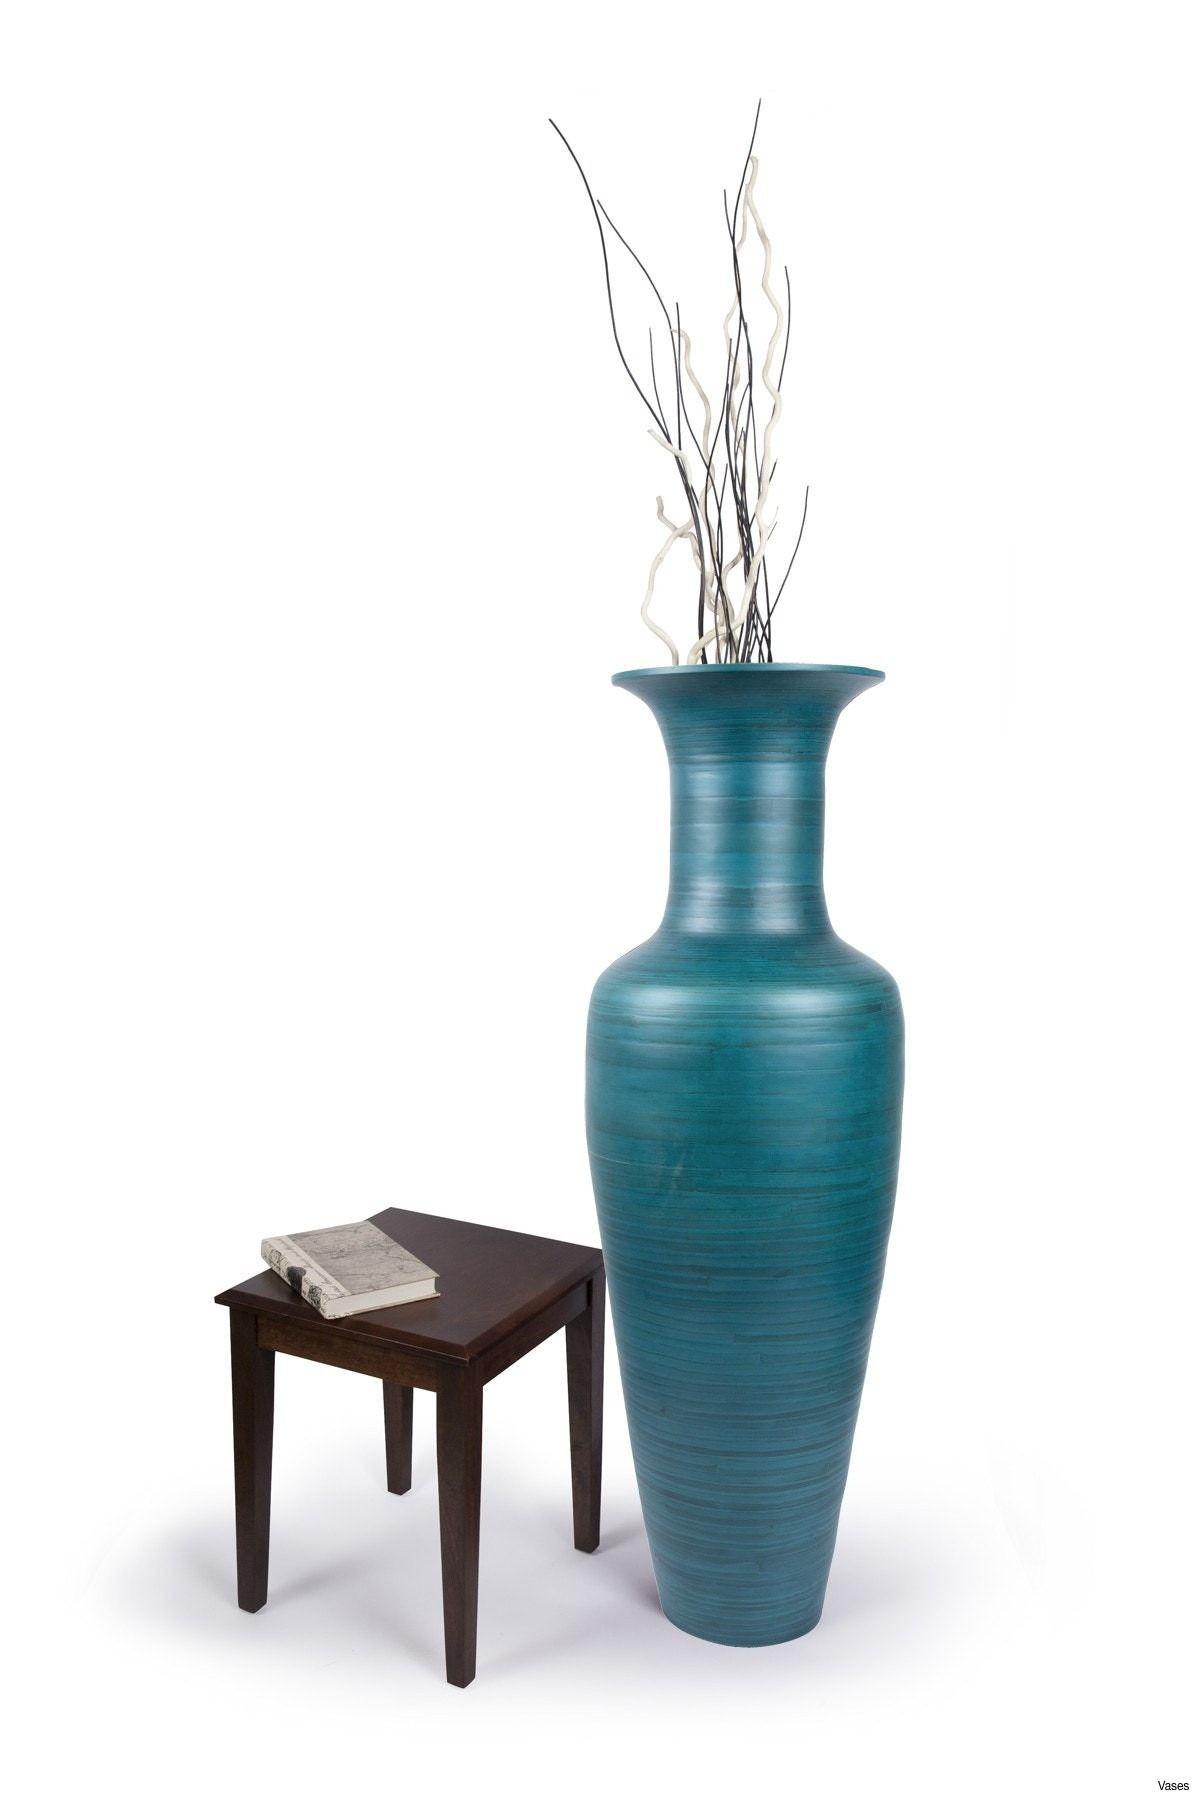 tall blue floor vase of tall vase with sticks elegant blue floor new inspiring blue floor throughout tall vase with sticks elegant blue floor new inspiring blue floor vases home design vase with